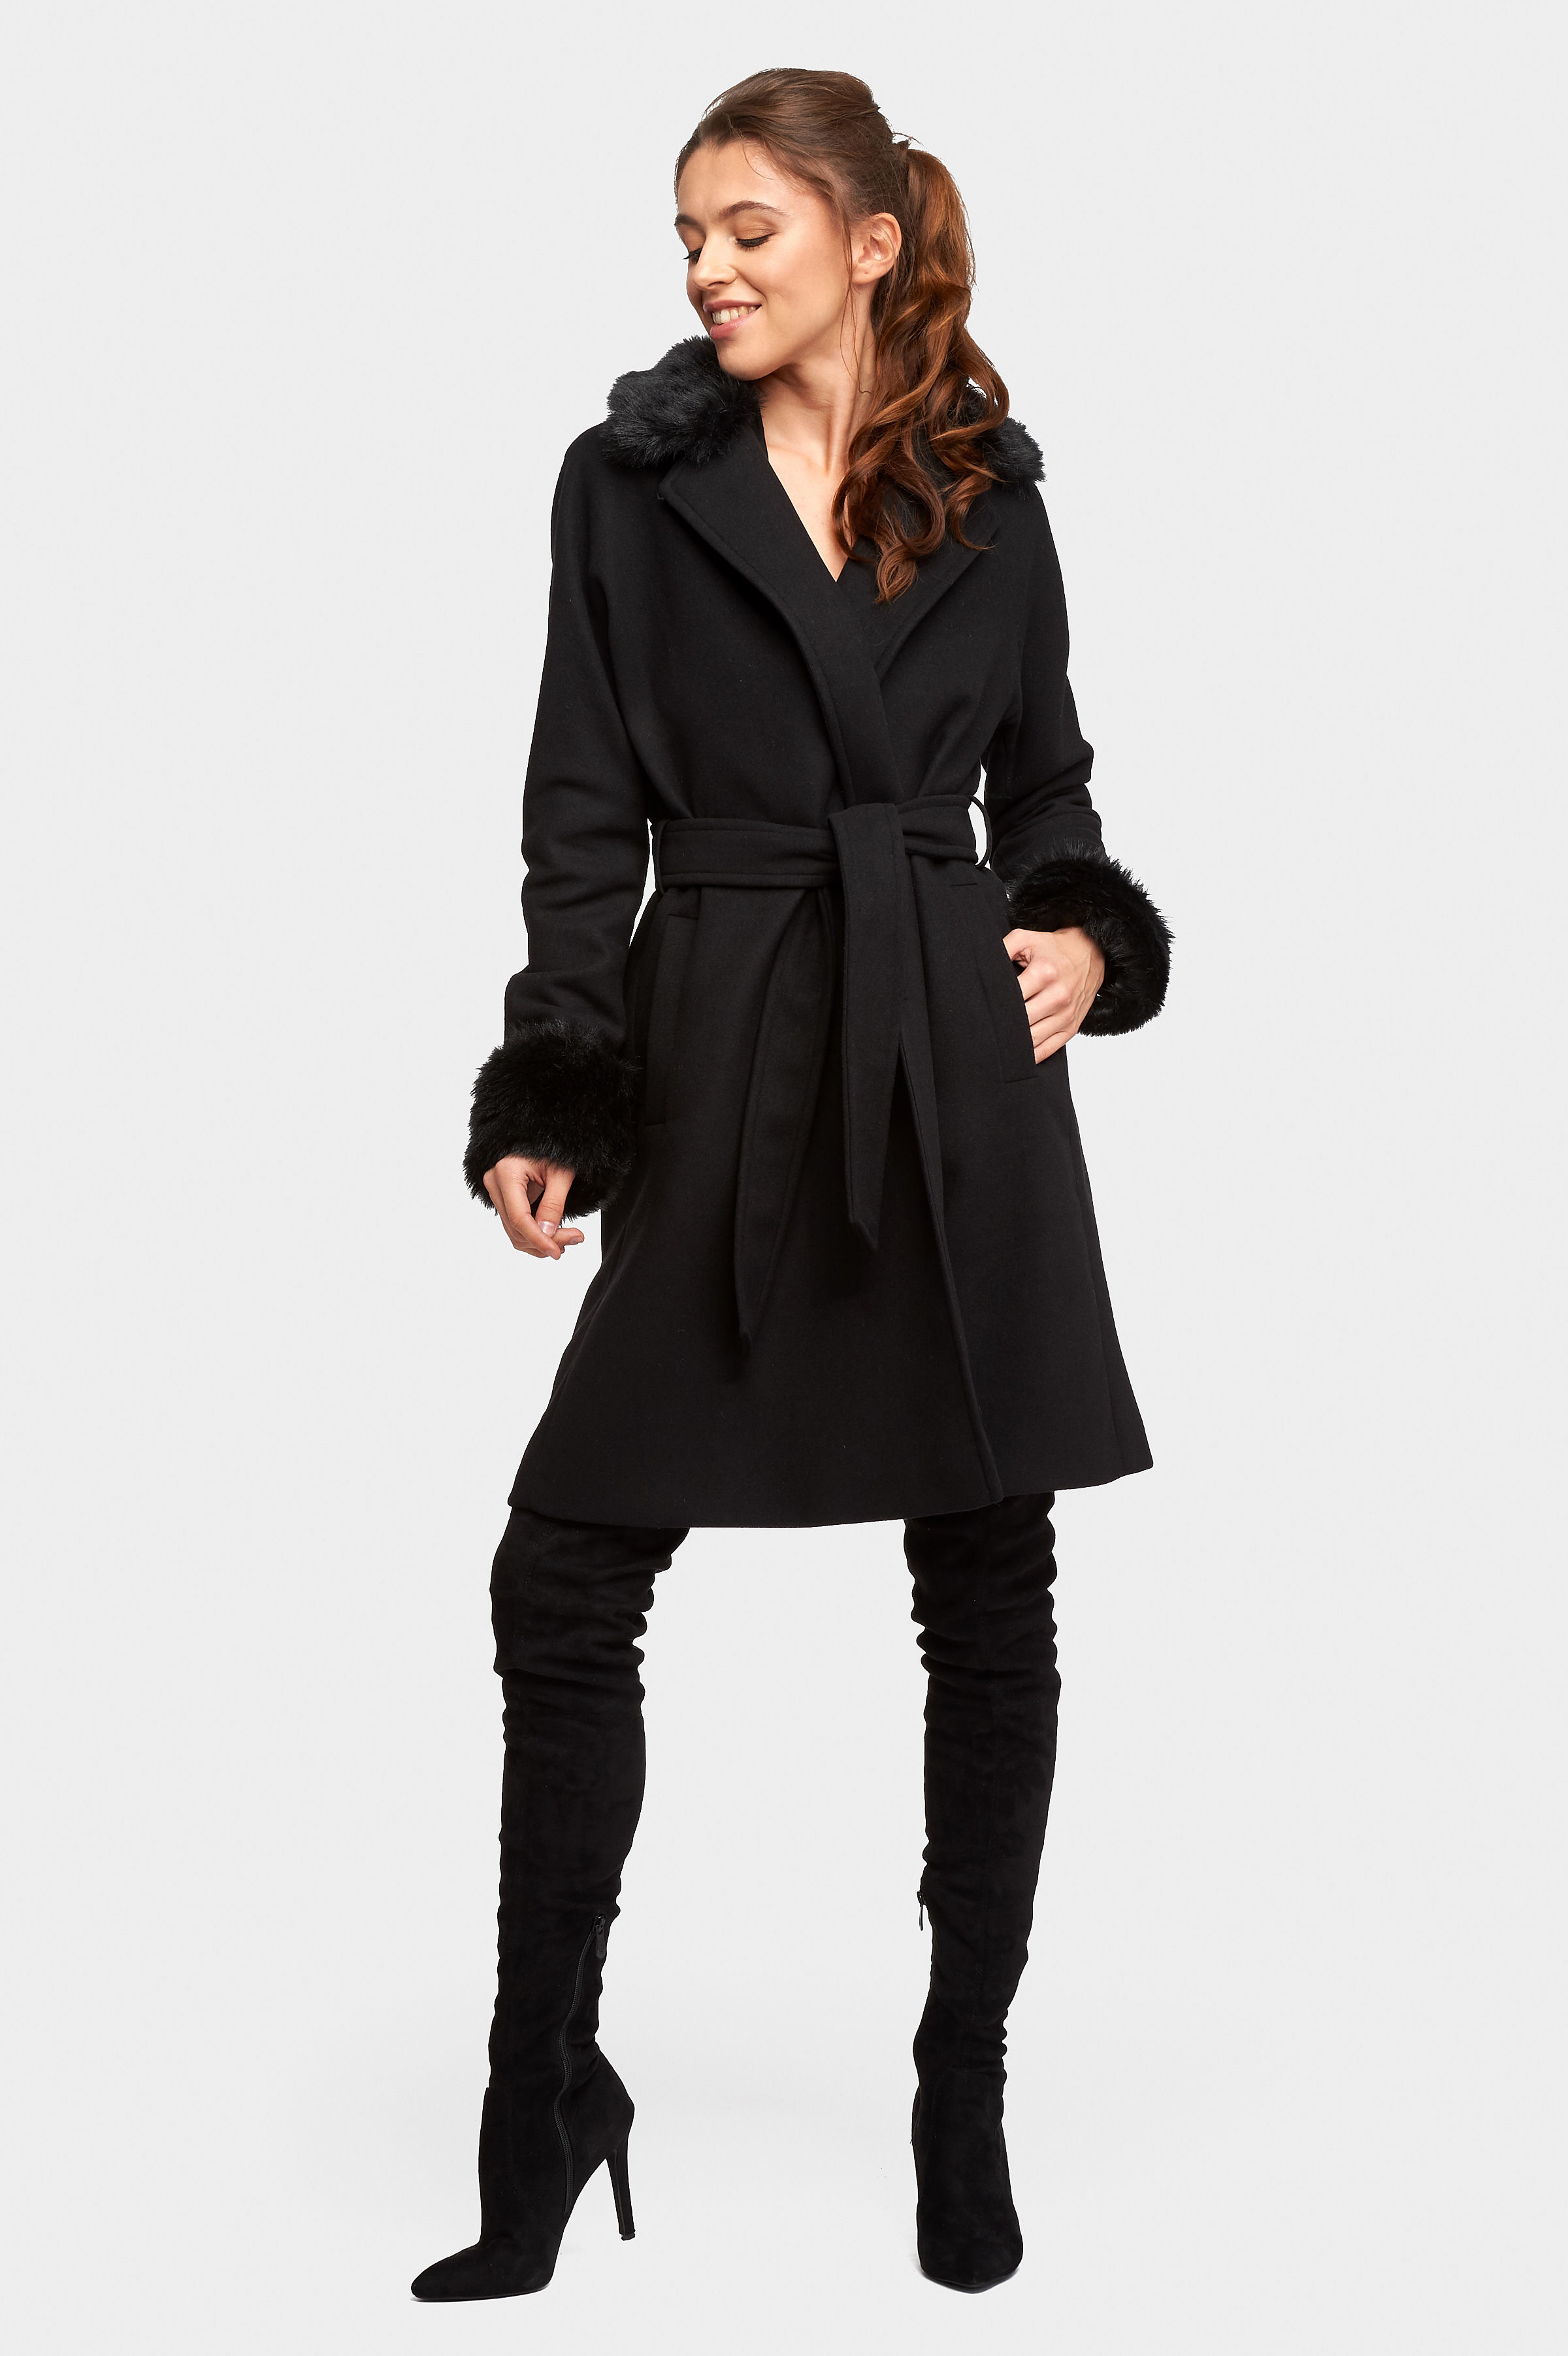 kabát Roxie - Kolekcia - Chantall.sk 2f0062f12a